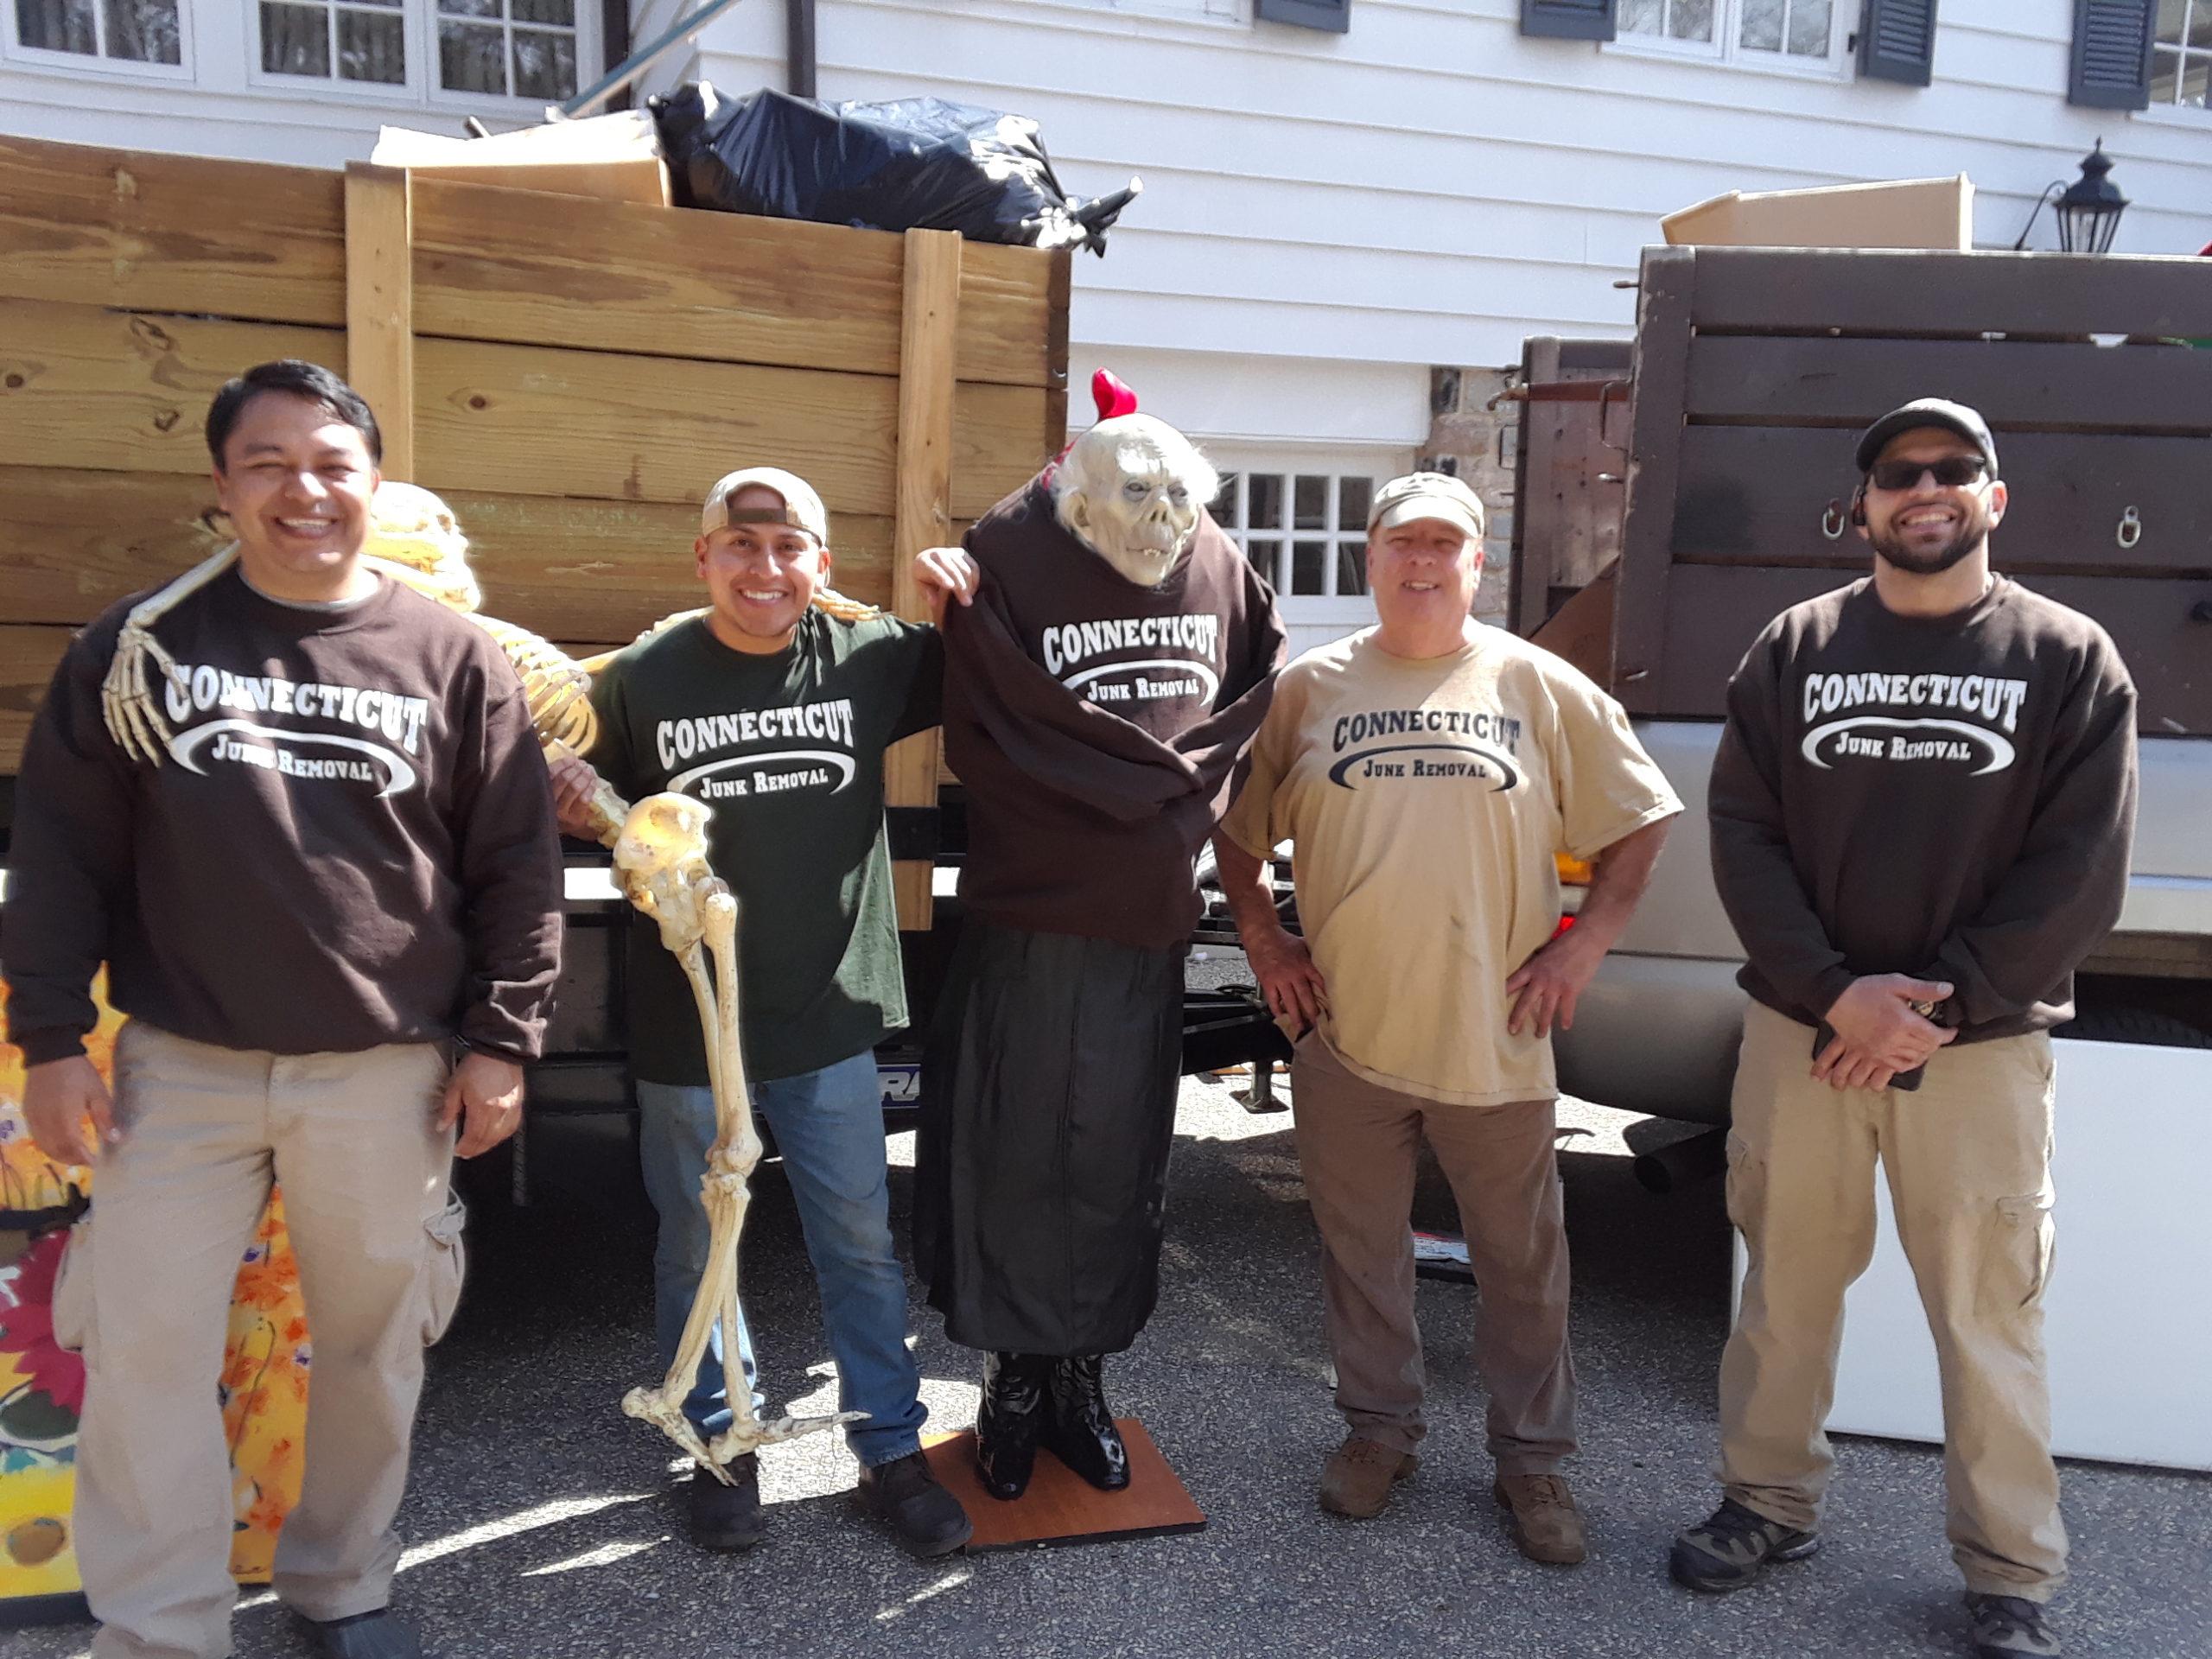 jennings junk removal crew